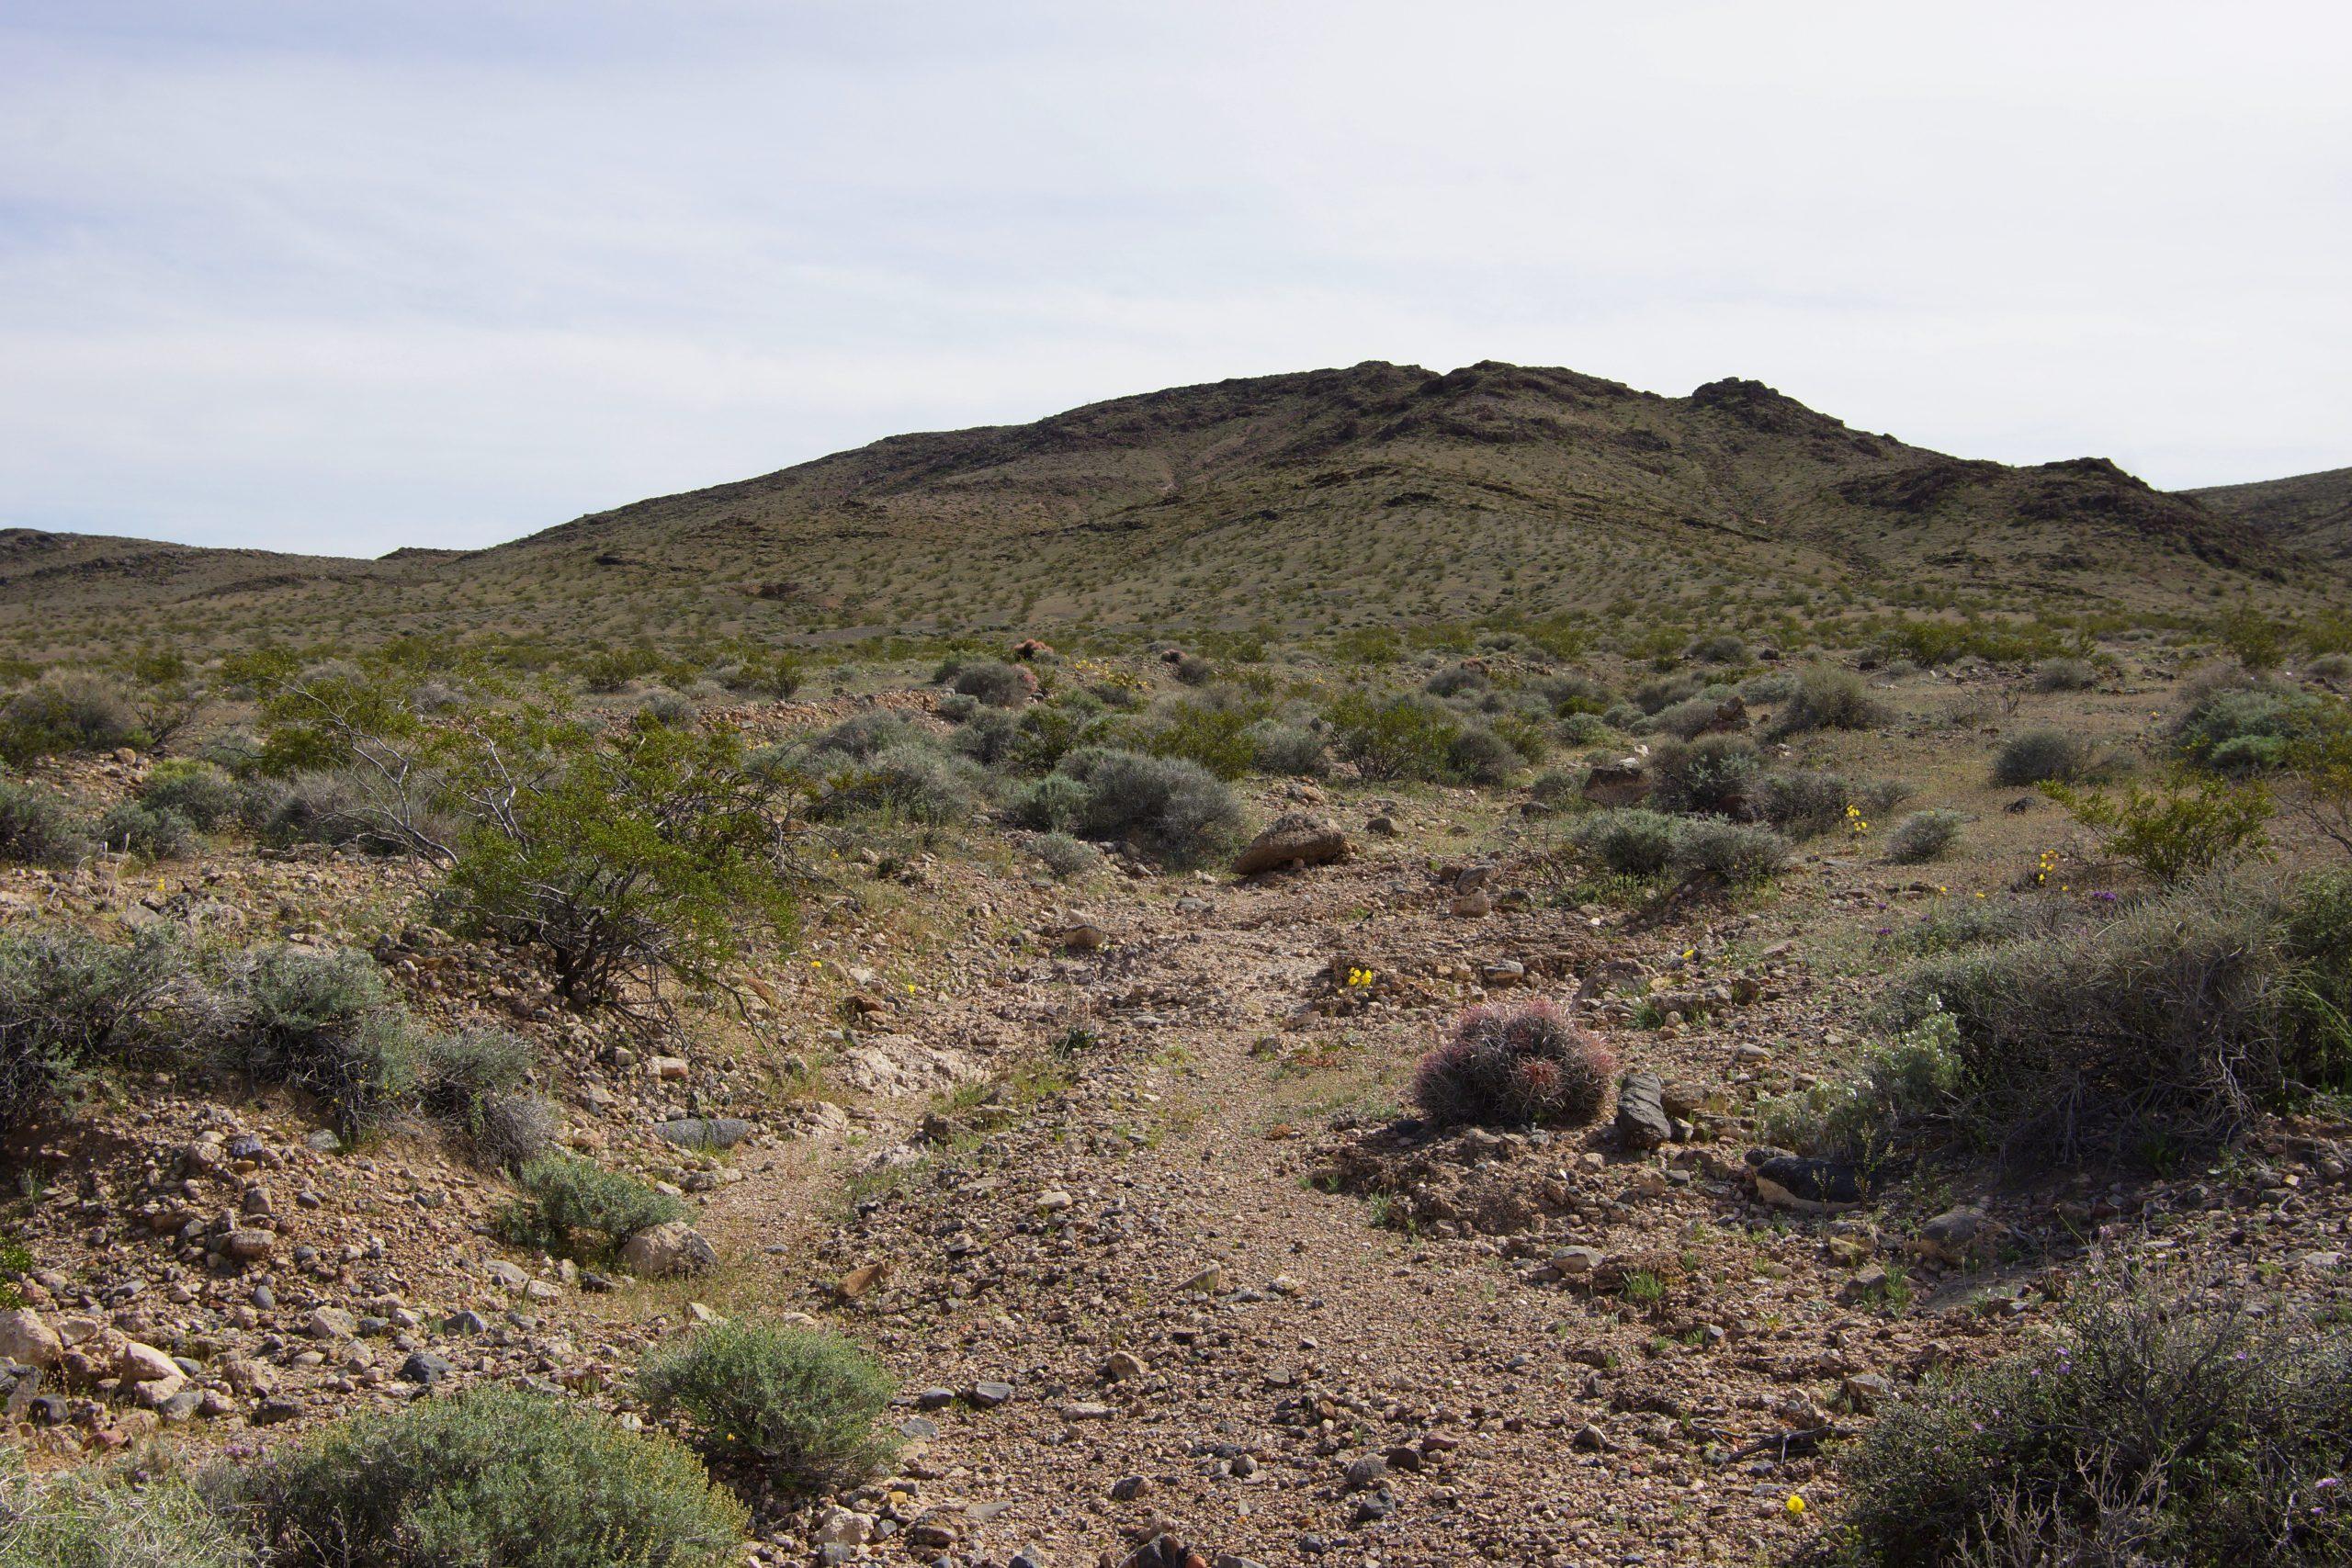 Egelcactus